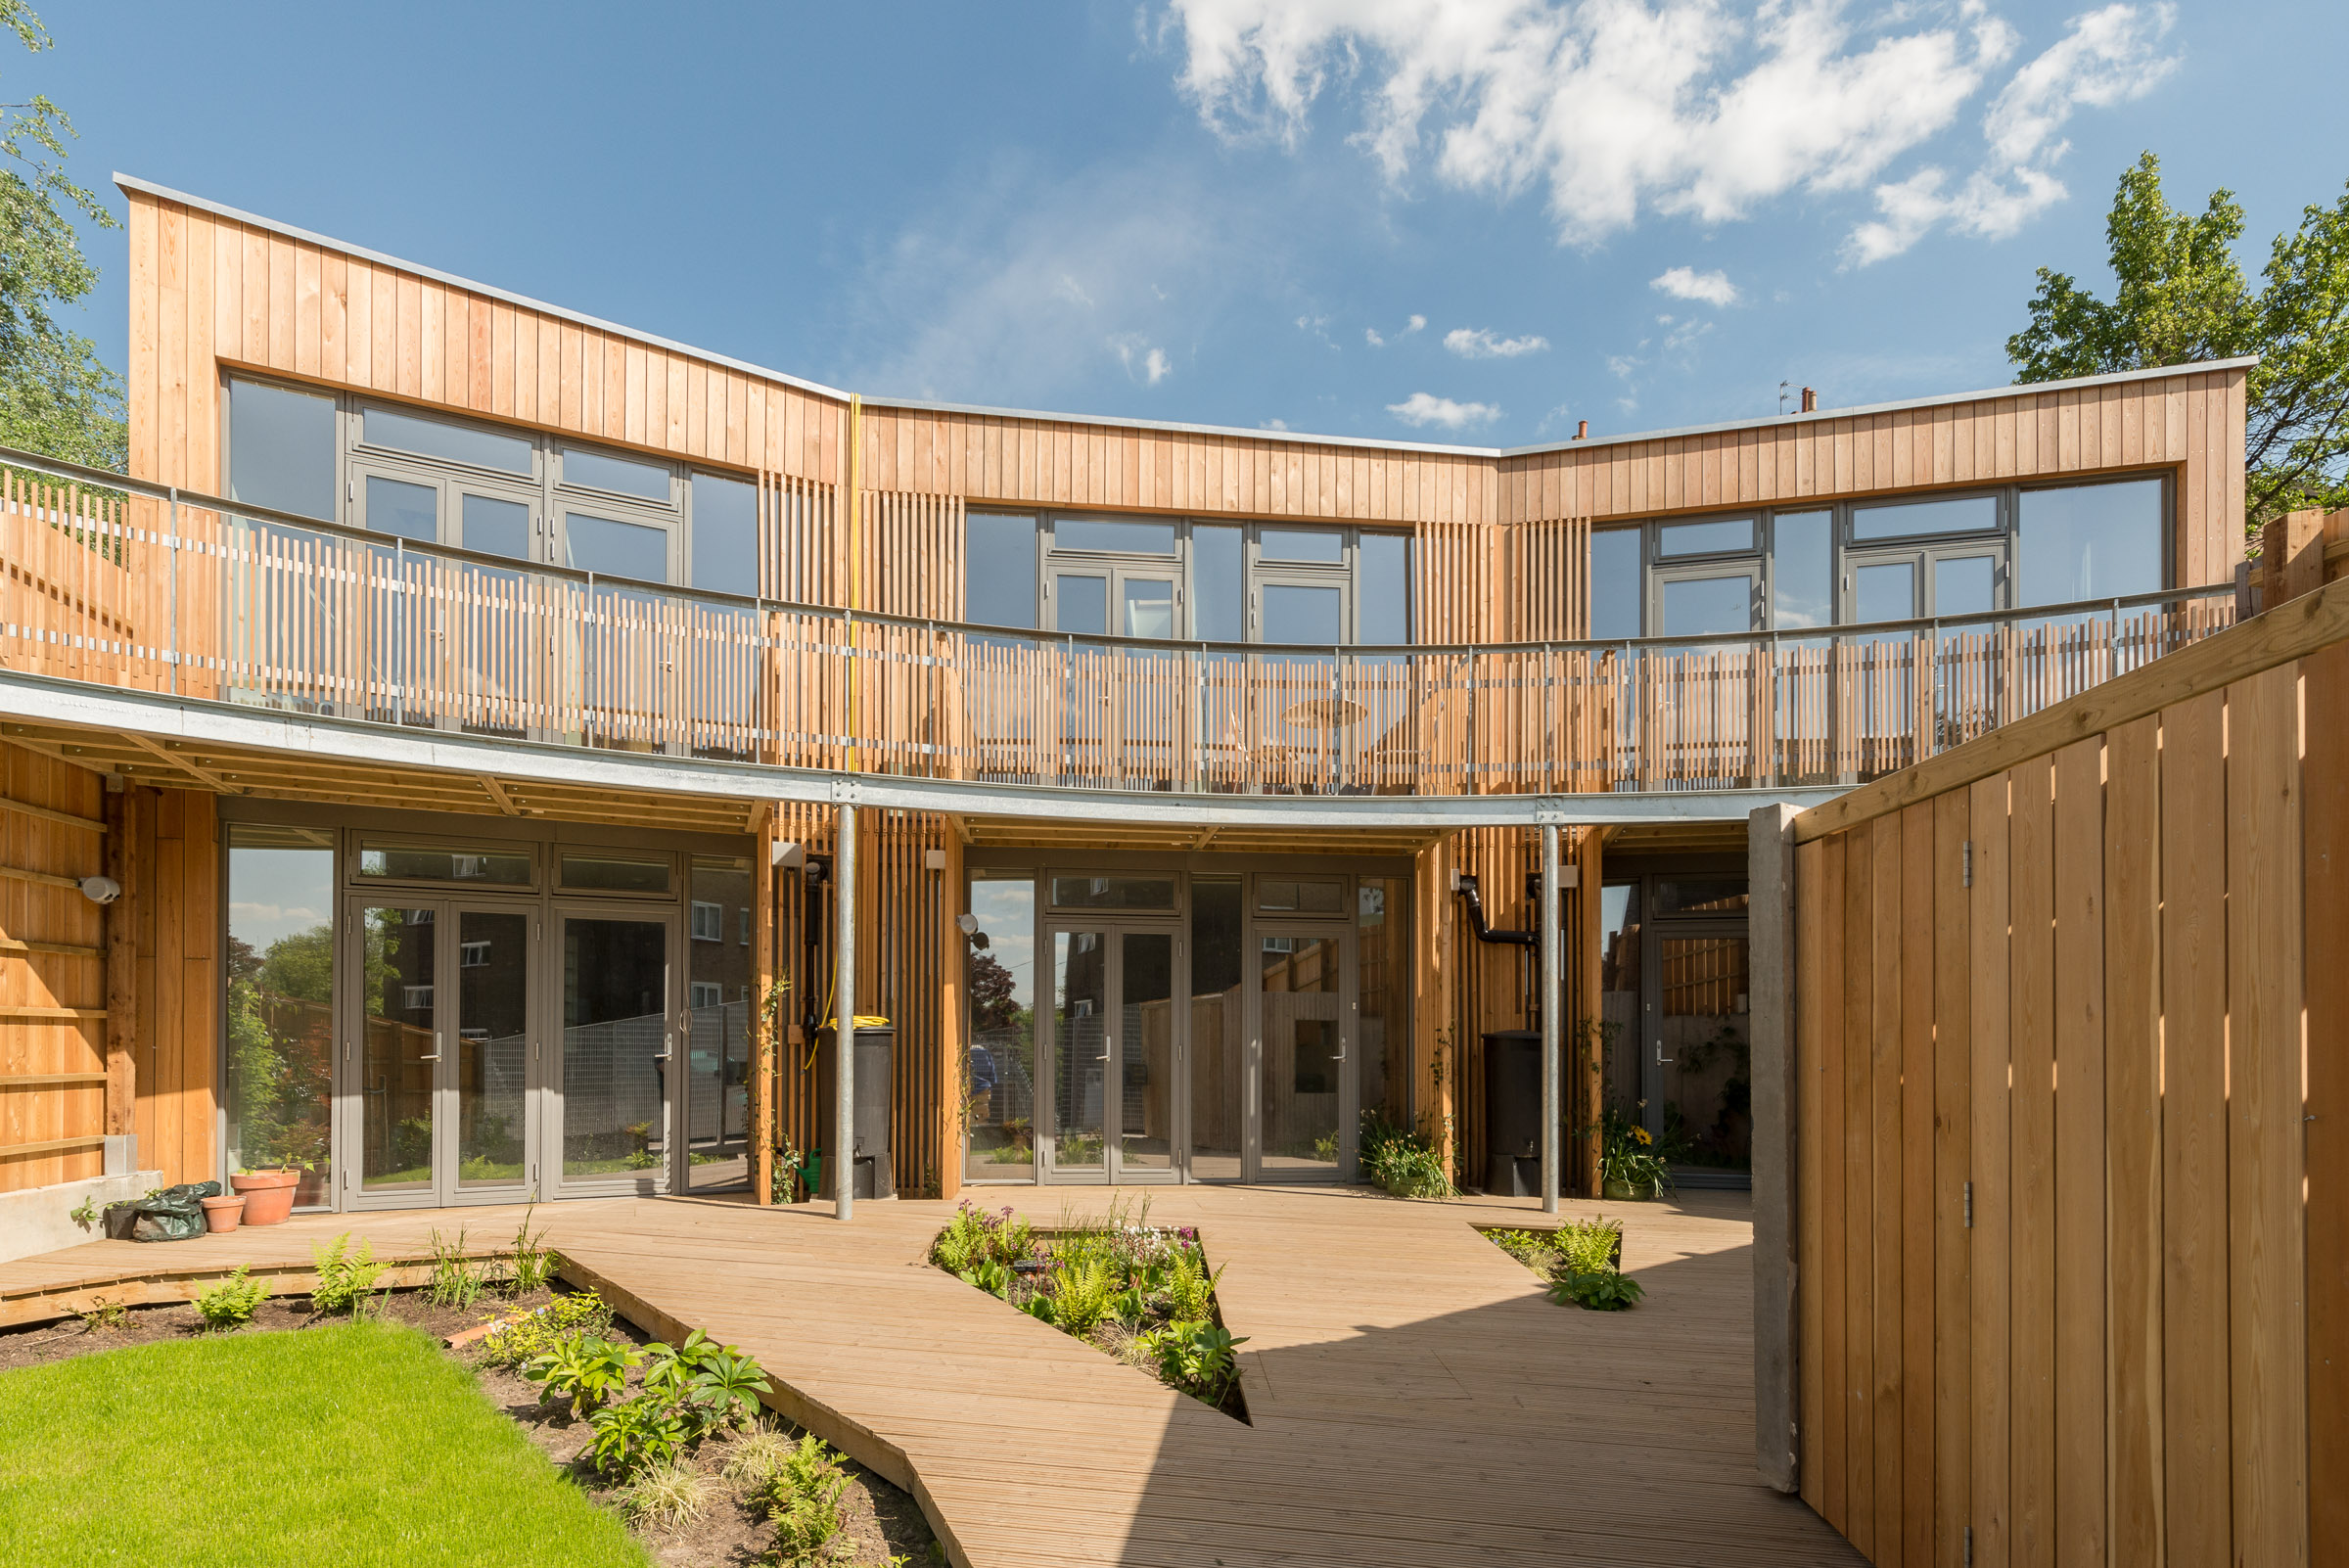 House 1, Eco Vale Wood Vale, London SE23 | The Modern House